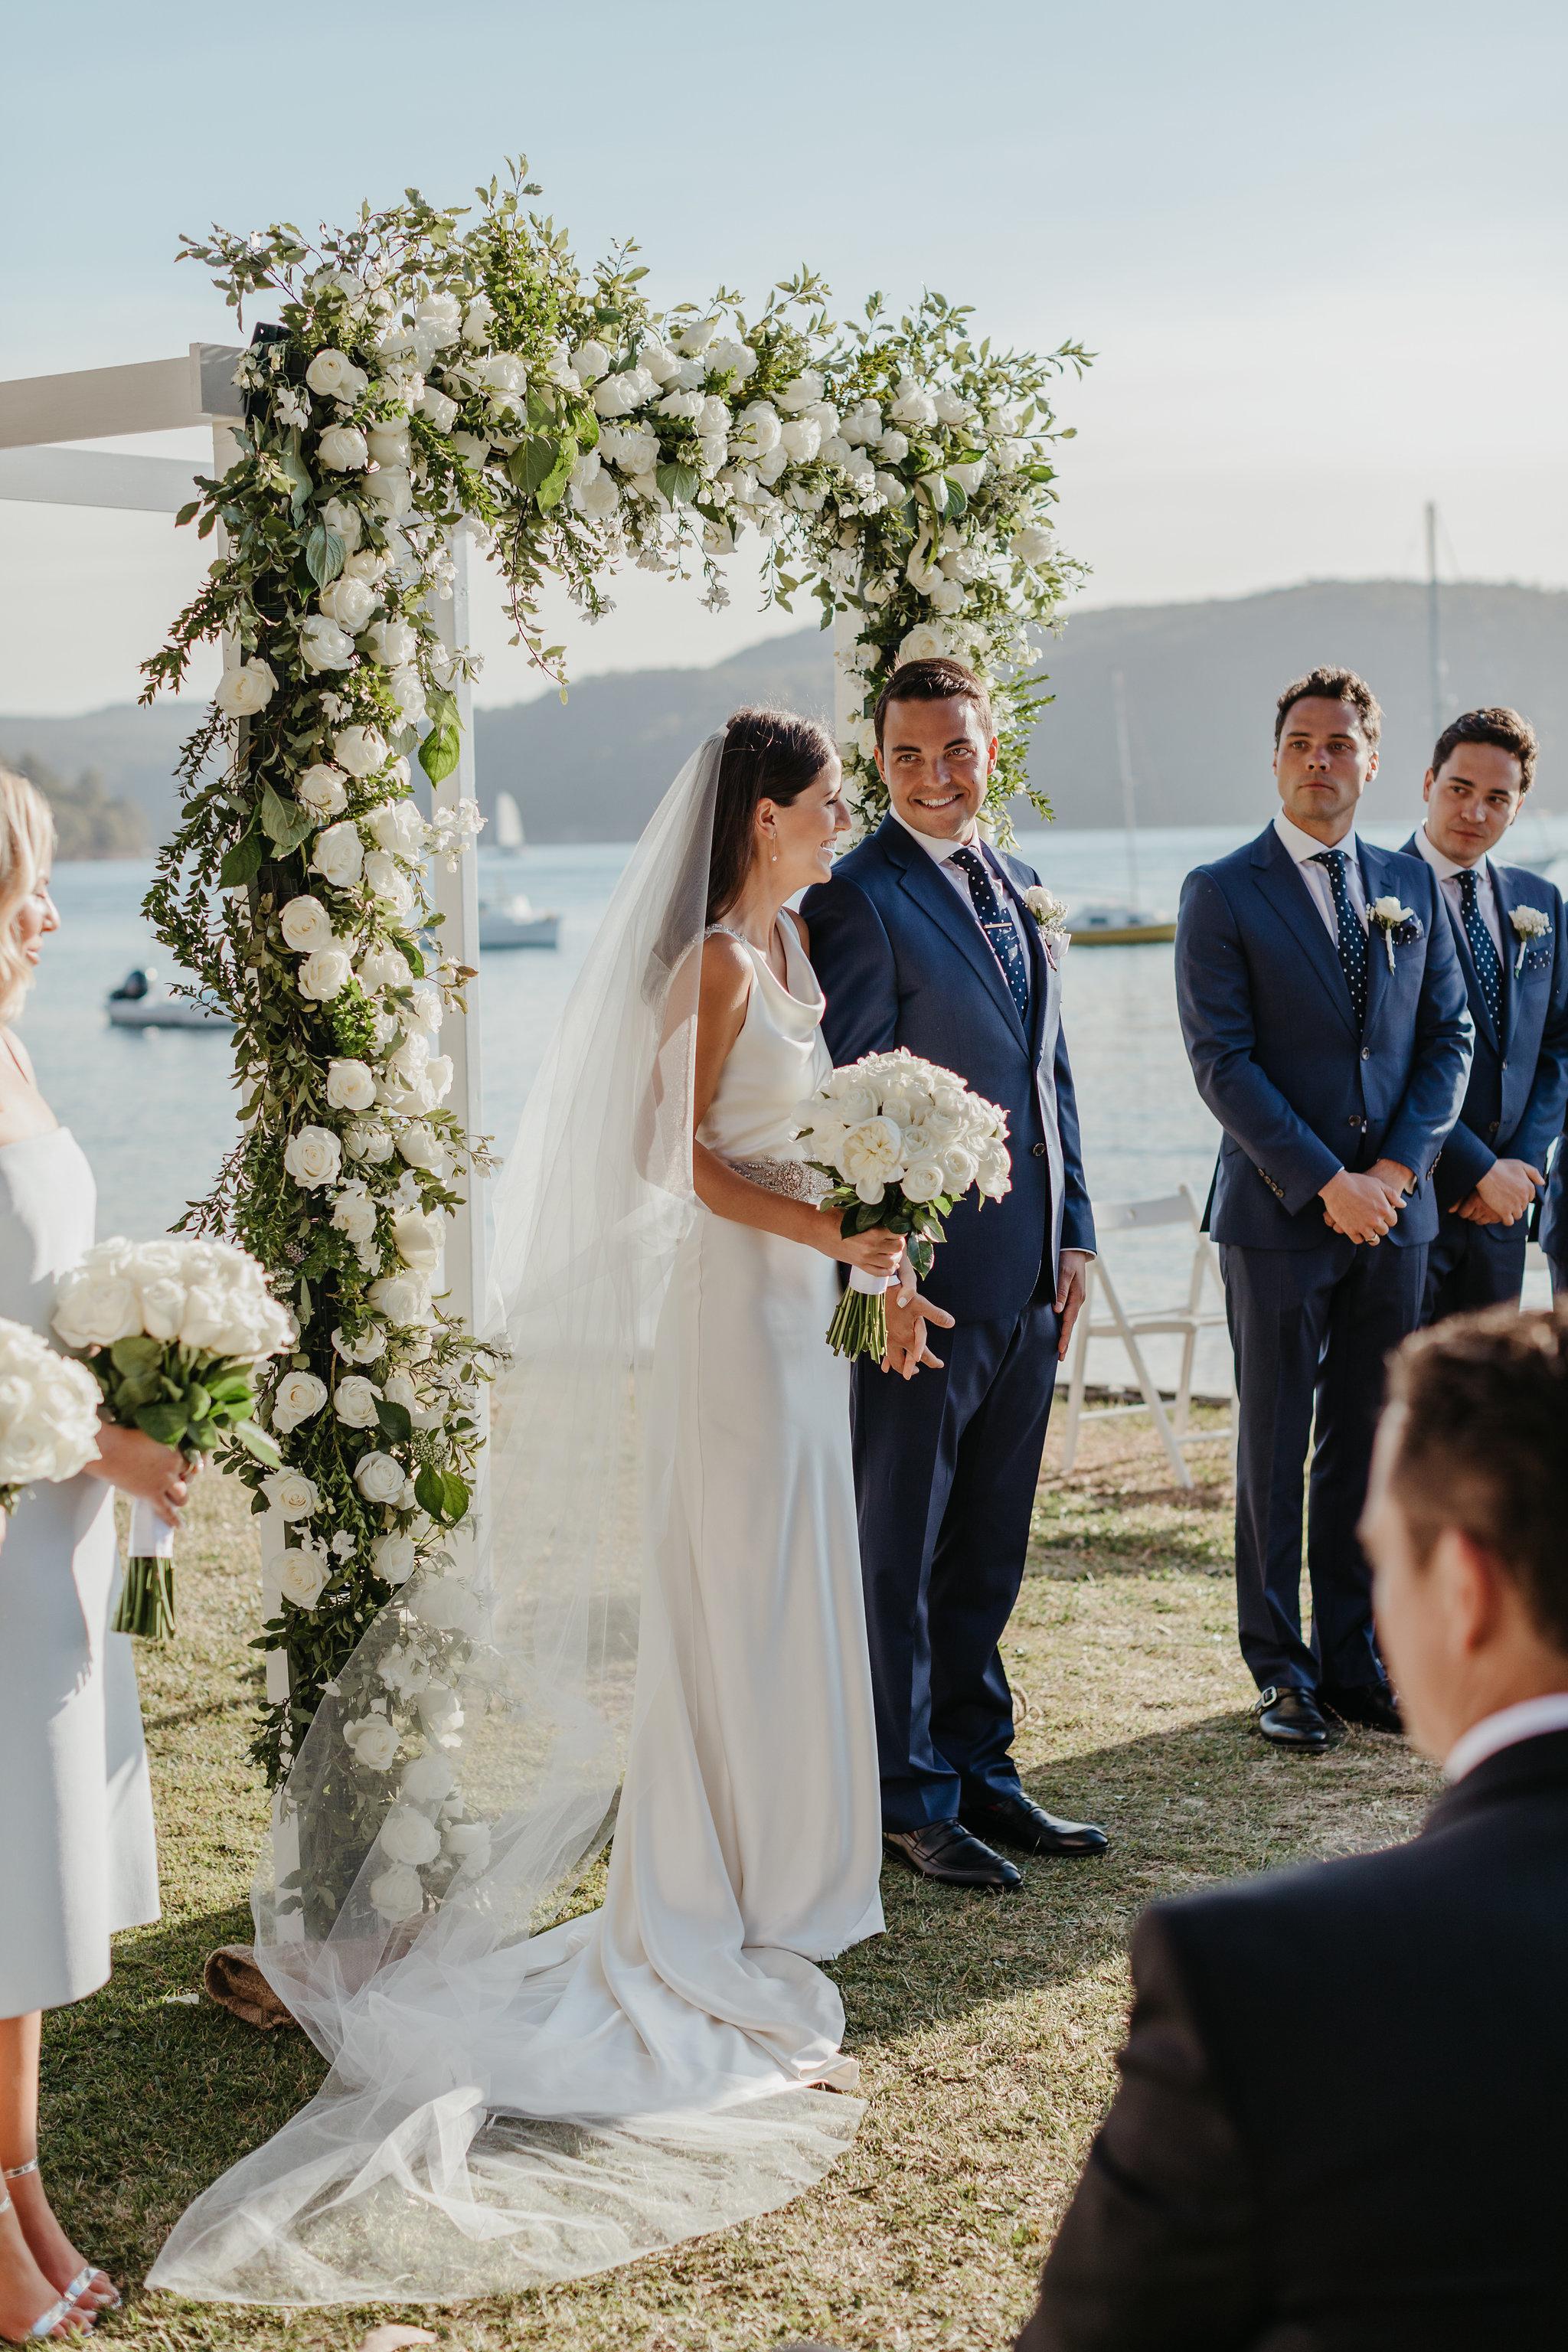 gen_chris_story_of_us_wedding-0262.JPG